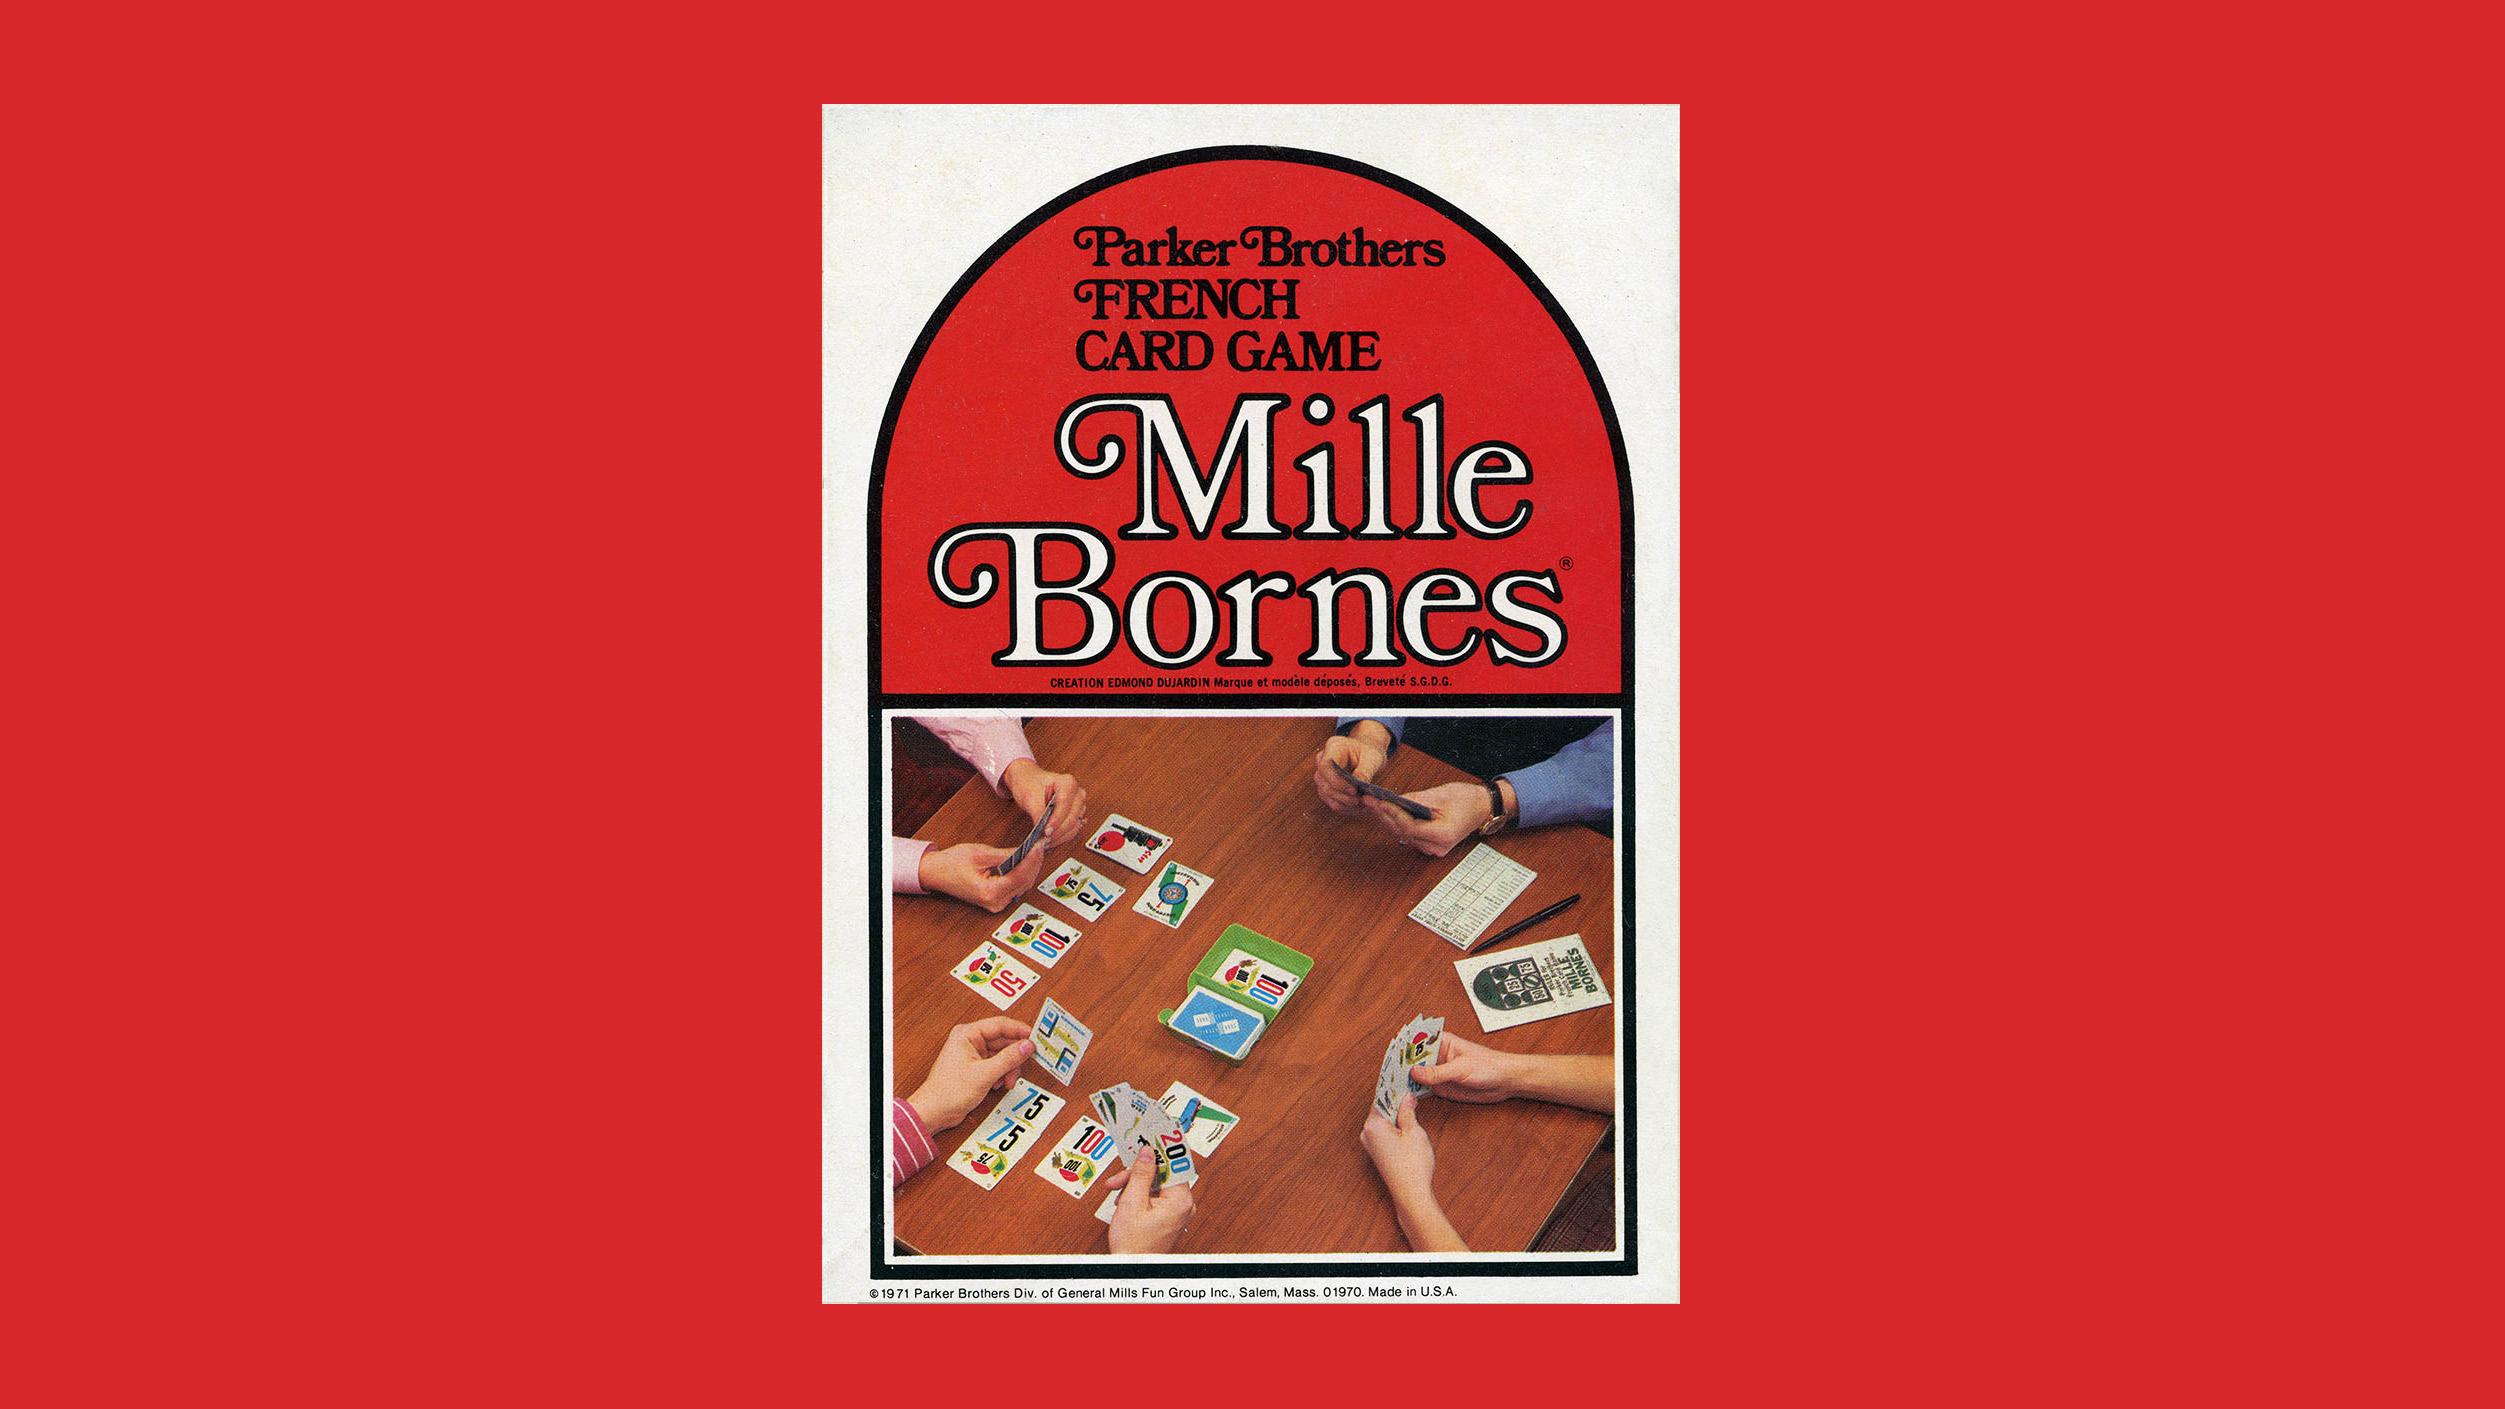 Mille Bornes box, image by Jim Hughes